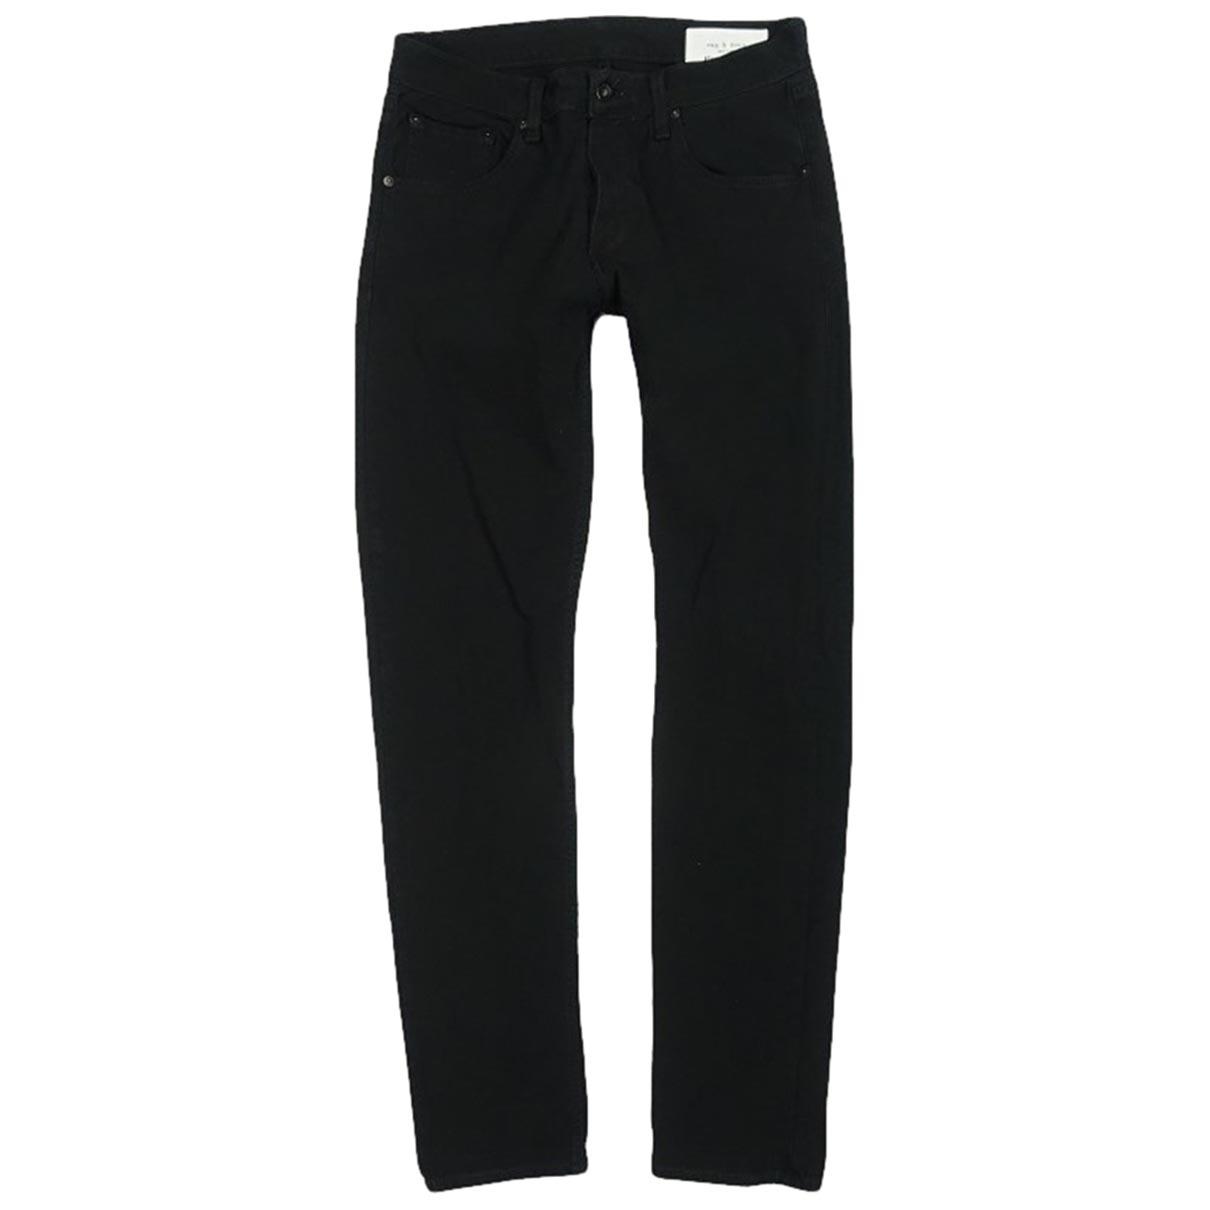 Rag & Bone \N Black Cotton - elasthane Jeans for Men 33 US